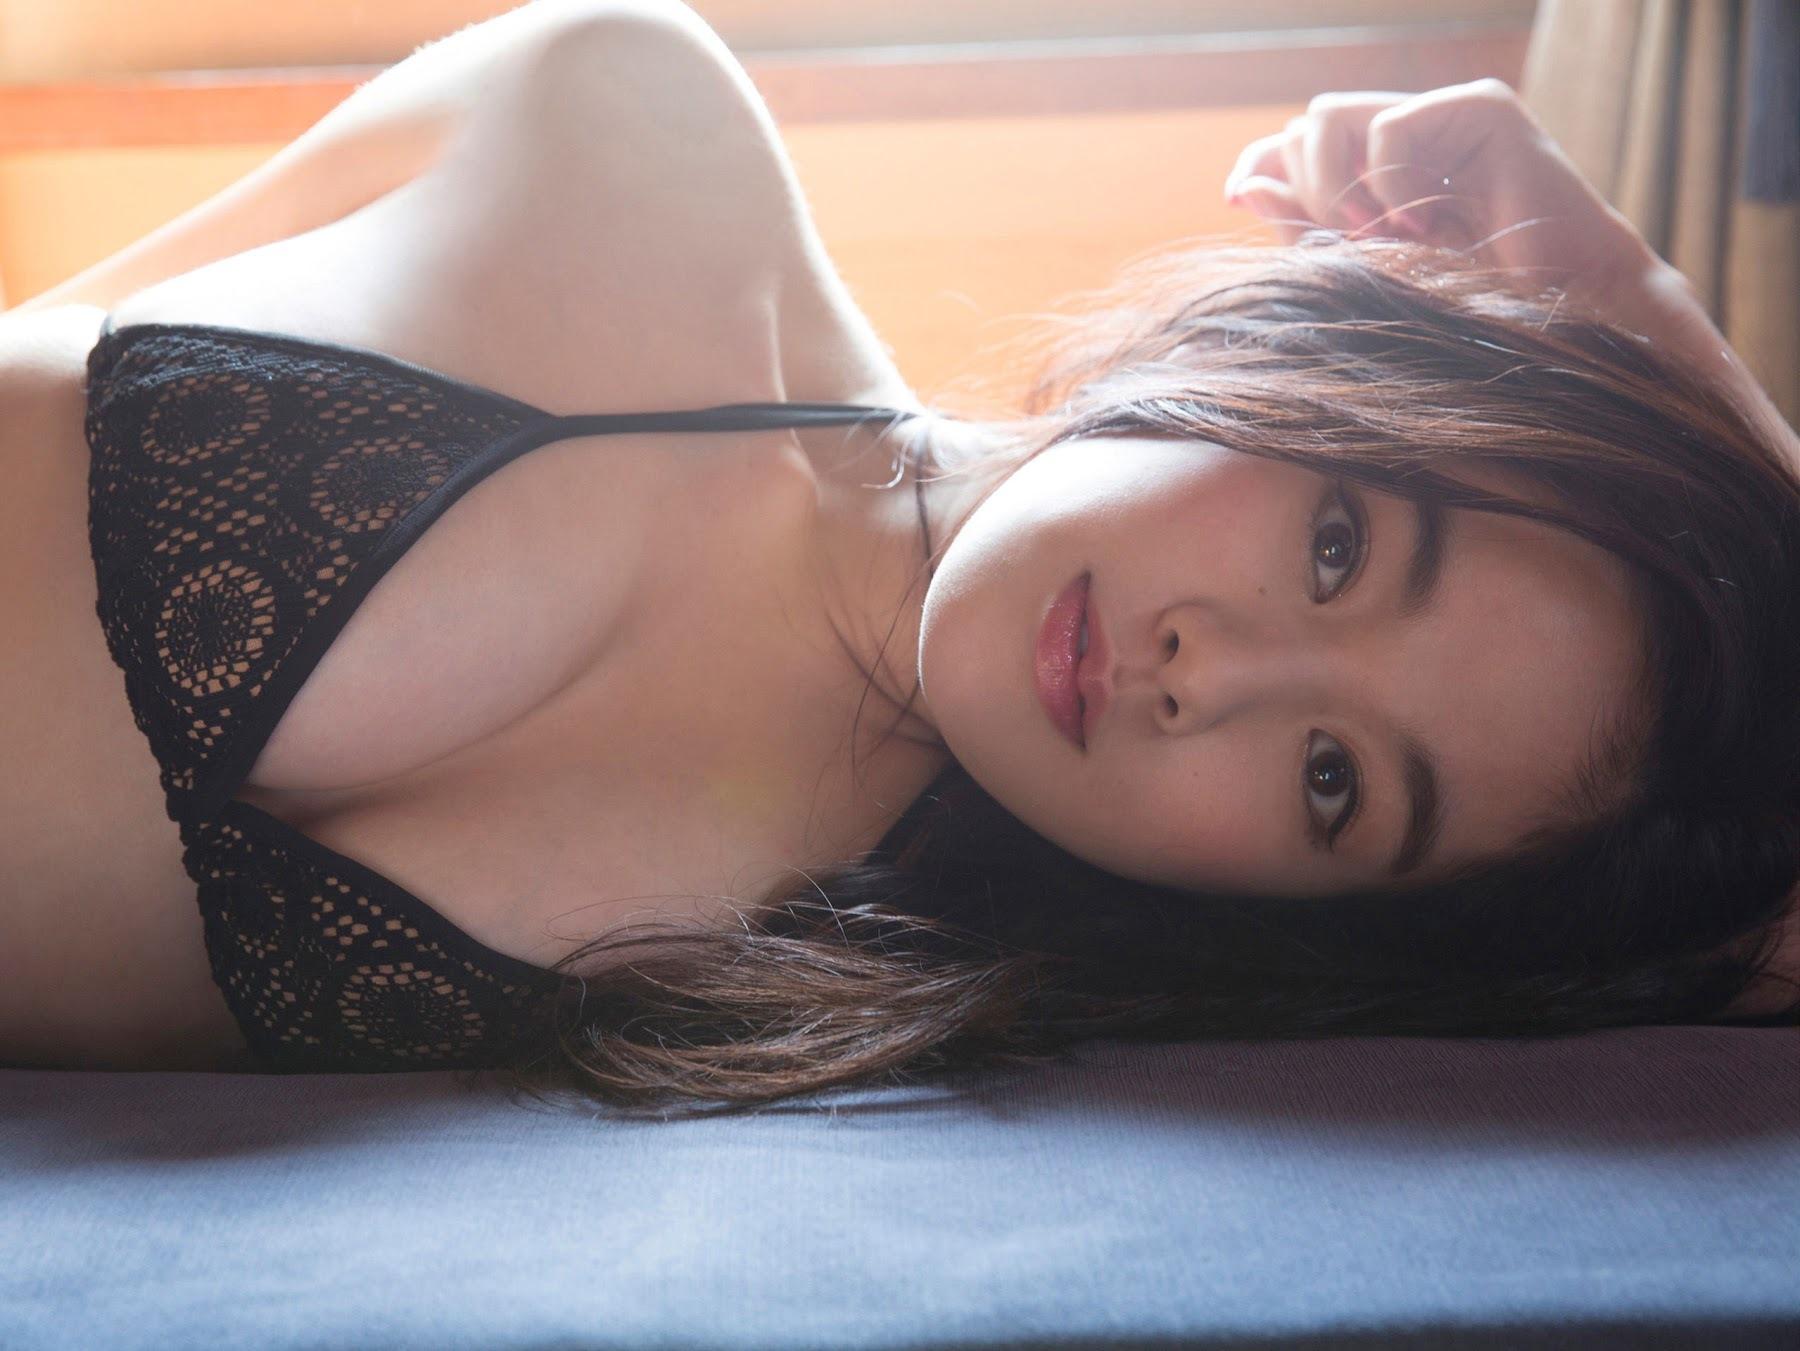 Goddess of Temptation Miwako Kakehi 051